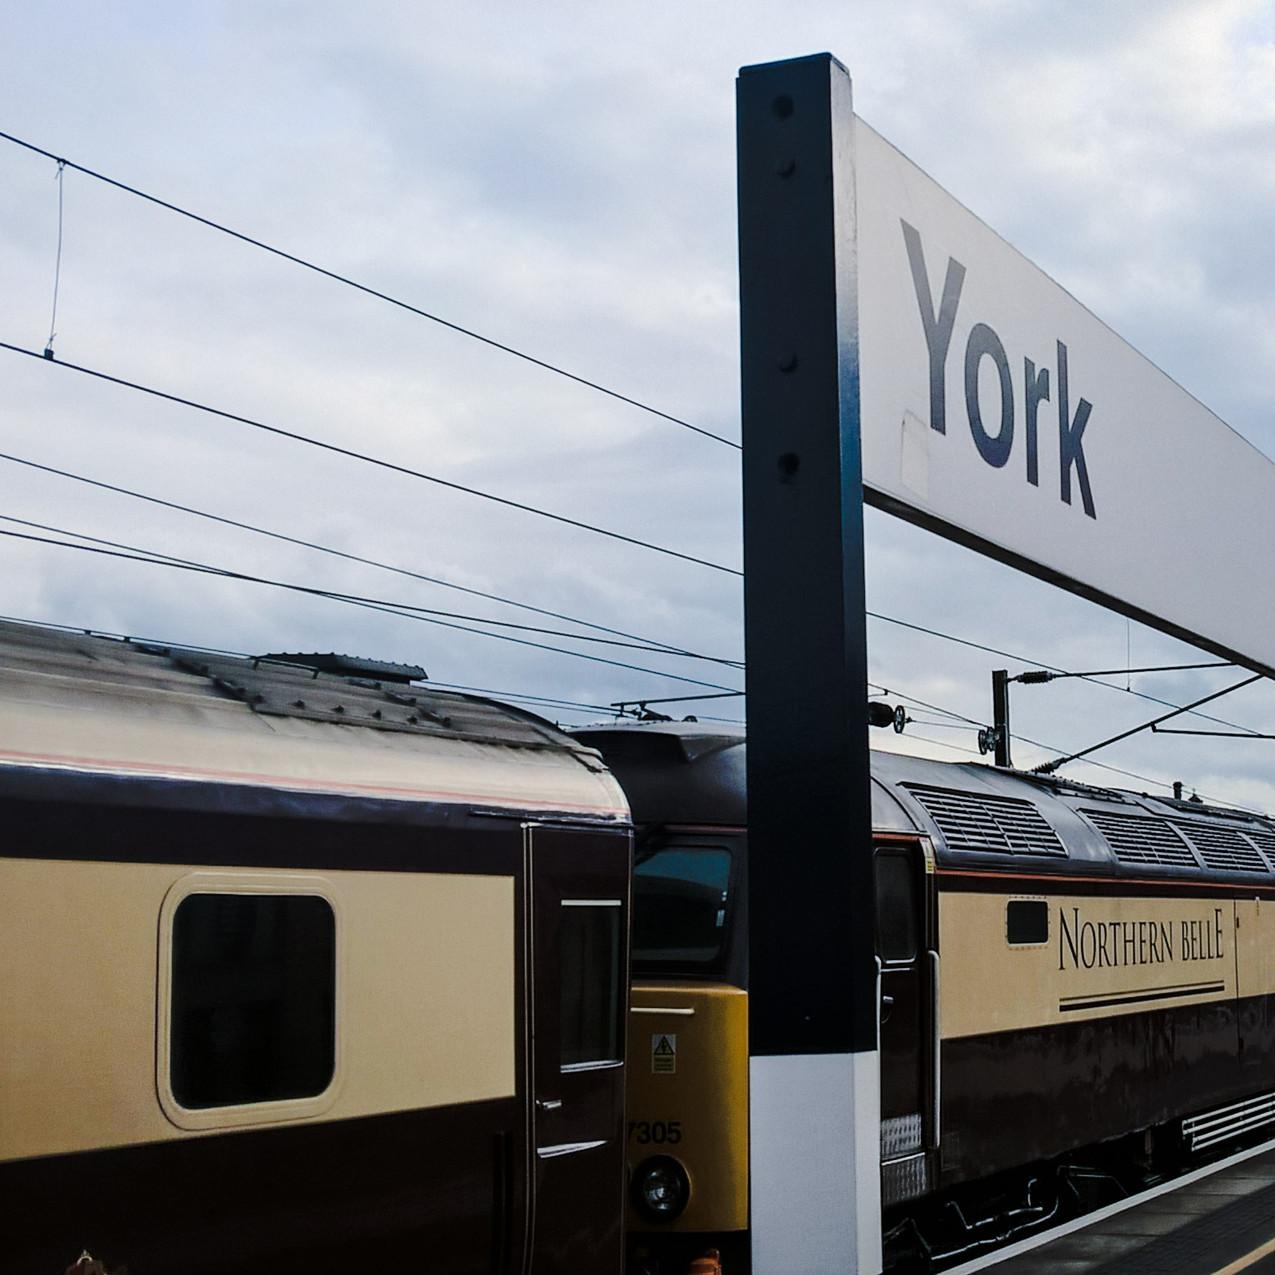 Northern Belle in York